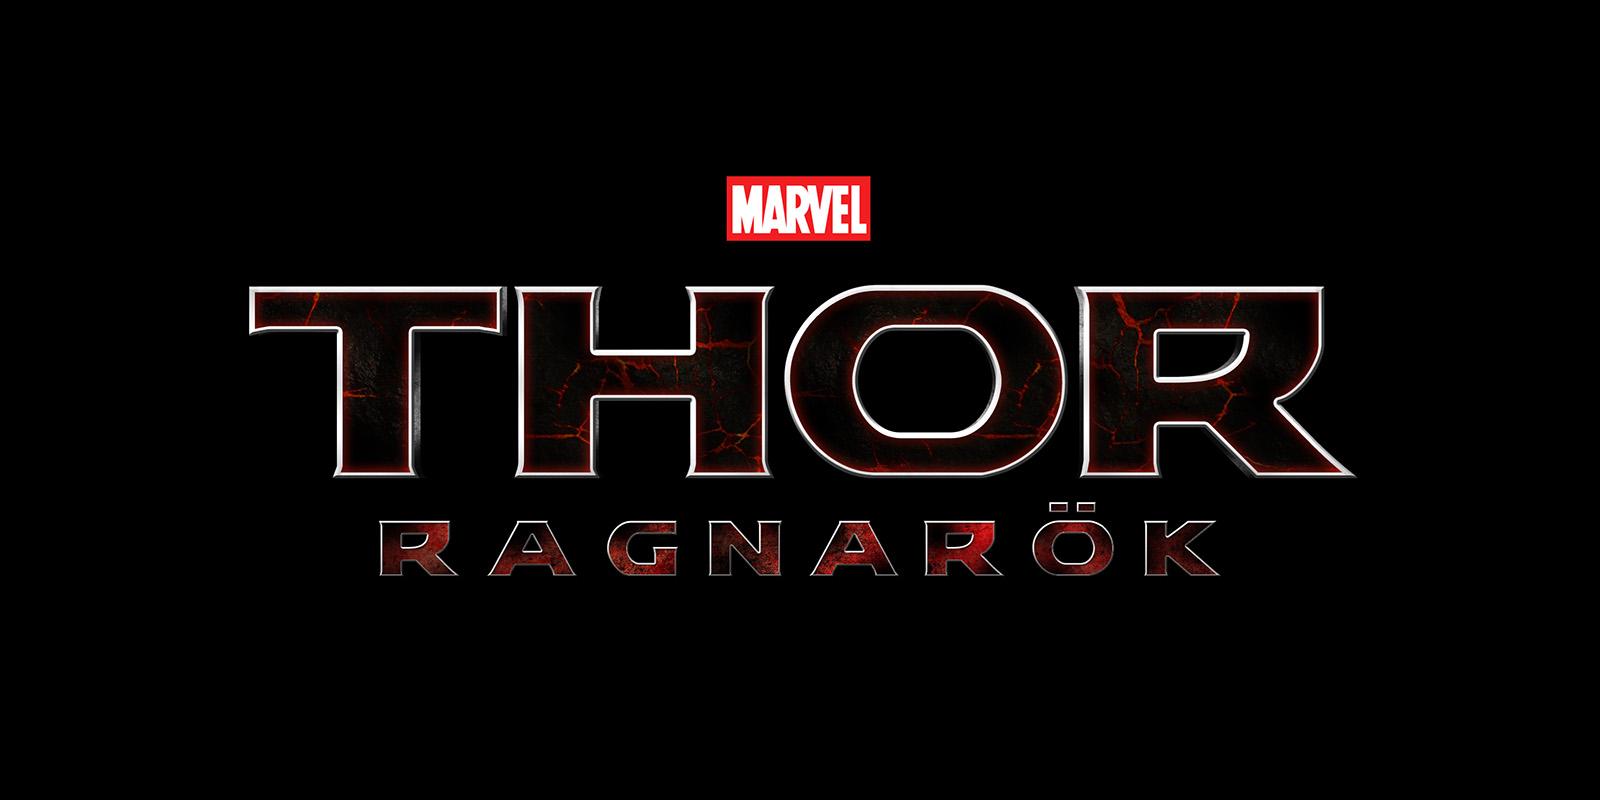 Natalie Portman no vuelve a Thor: Ragnarok y Tessa Thompson se une al elenco